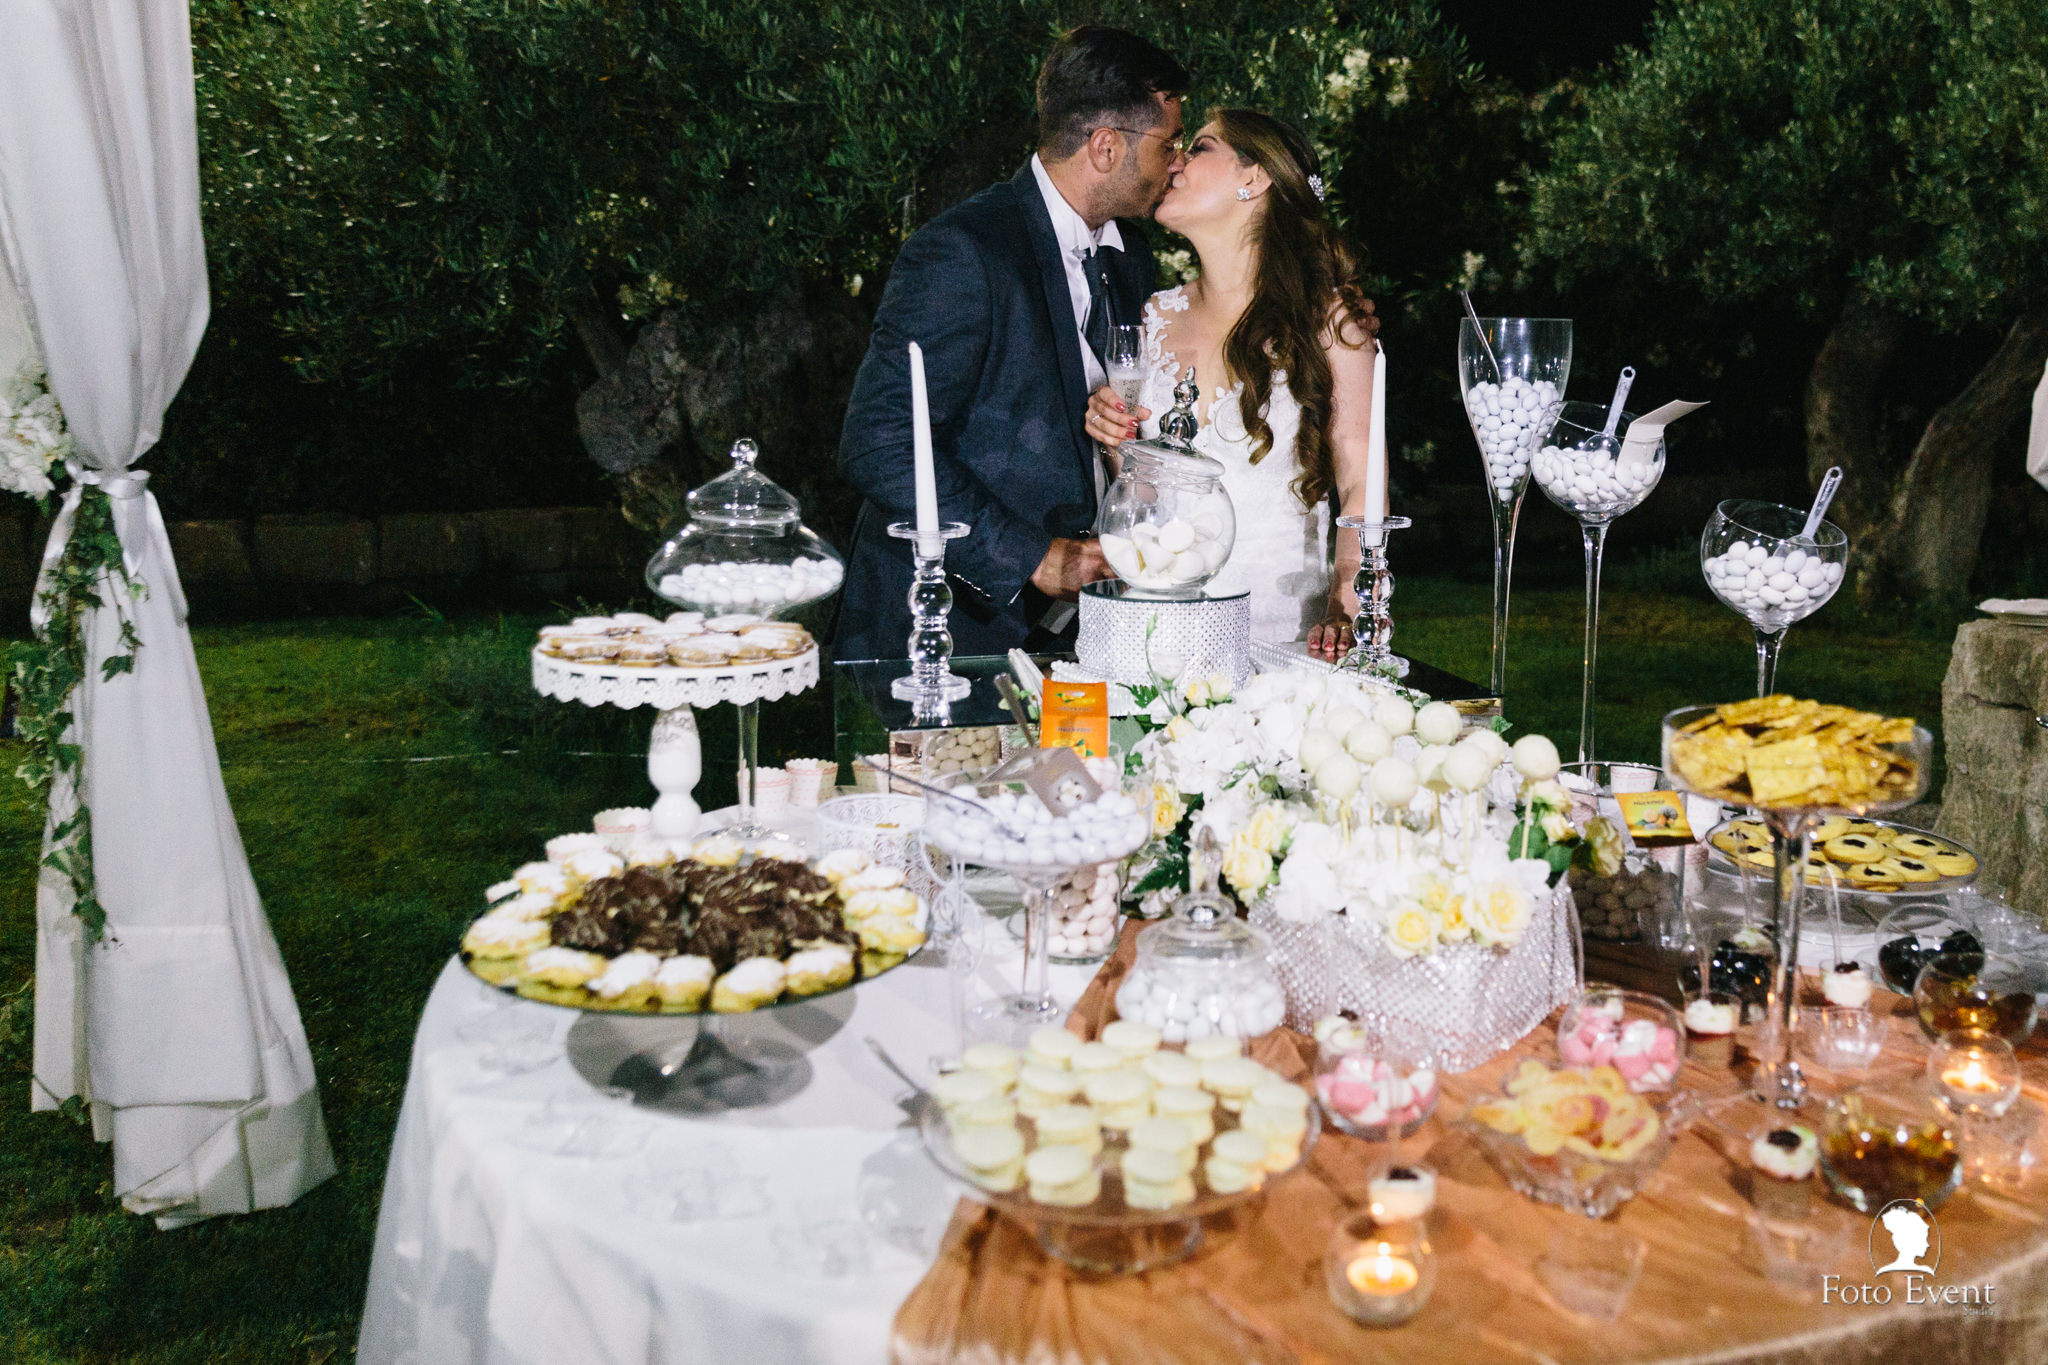 046-2019-06-12-Matrimonio-Rosa-e-Angelo-Ripellino-5DE-1754